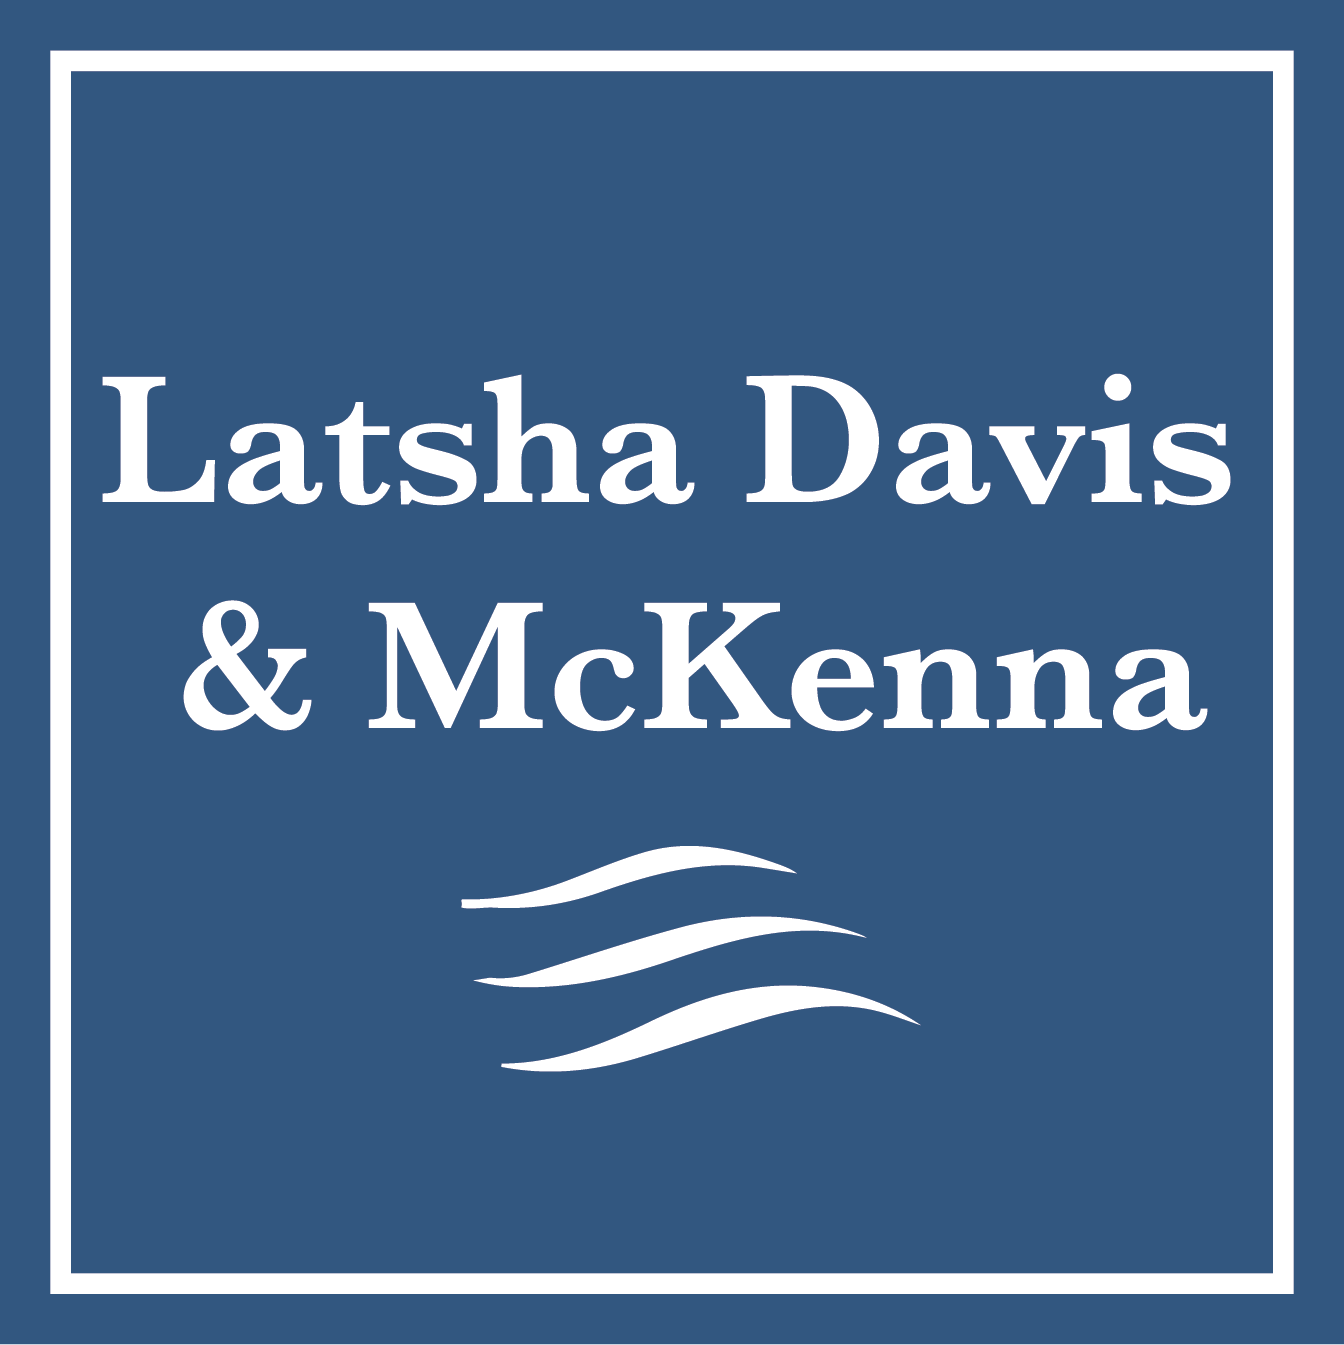 The Law Firm of Latsha Davis & McKenna, P.C.